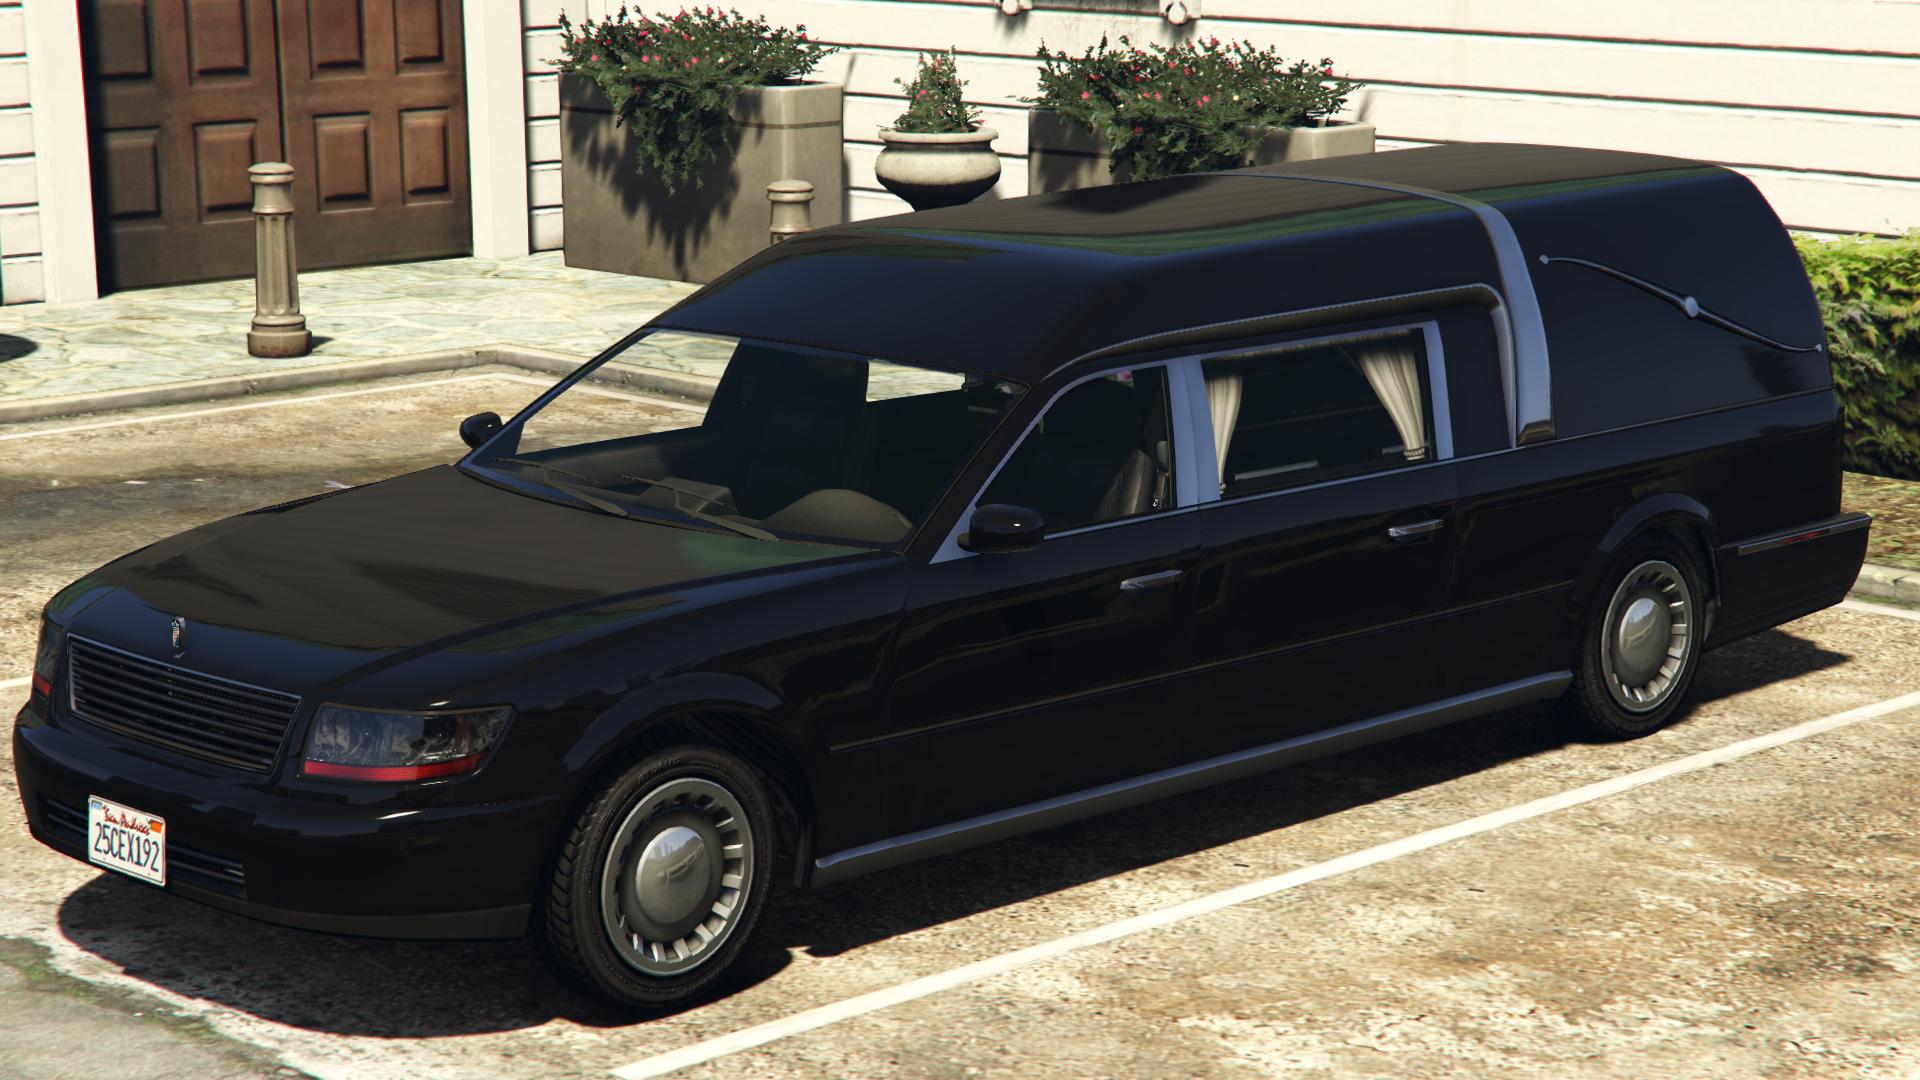 Image cj gtav transparent png gta wiki the grand theft auto wiki - The Romero Hearse In Grand Theft Auto V Rear Quarter View